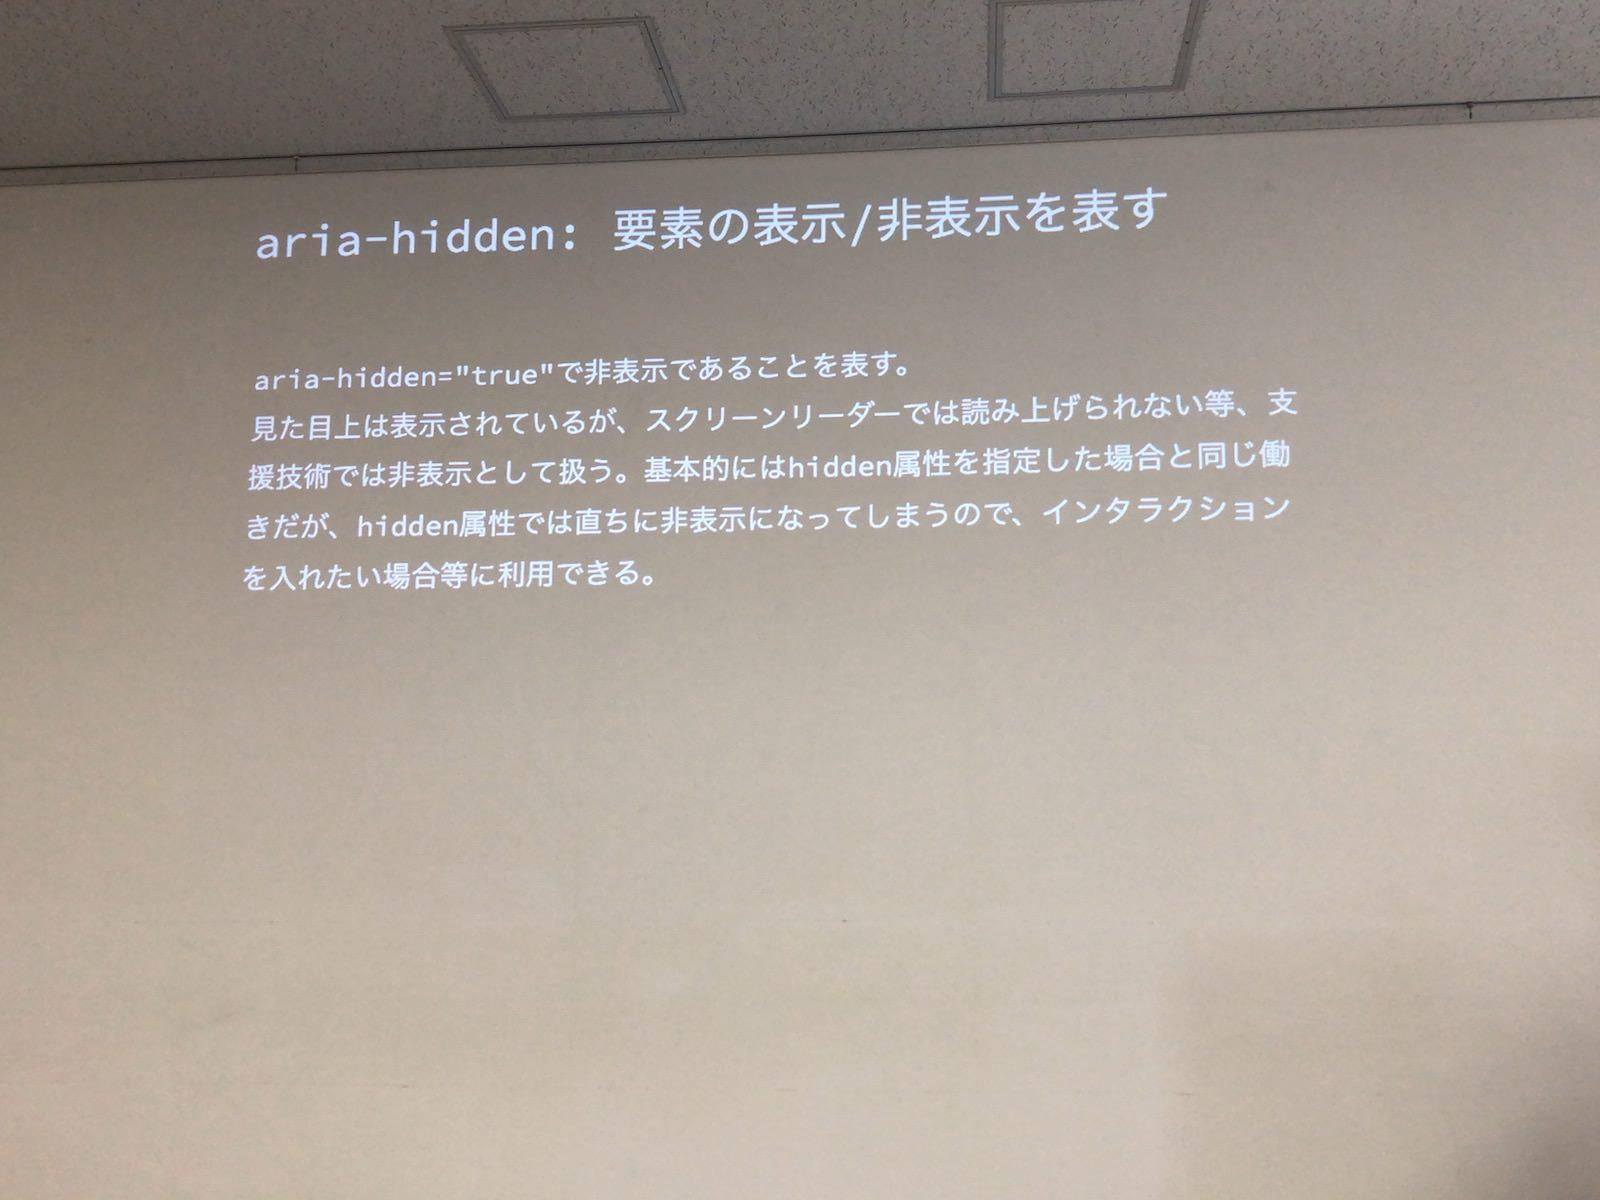 aria-hidden属性の解説